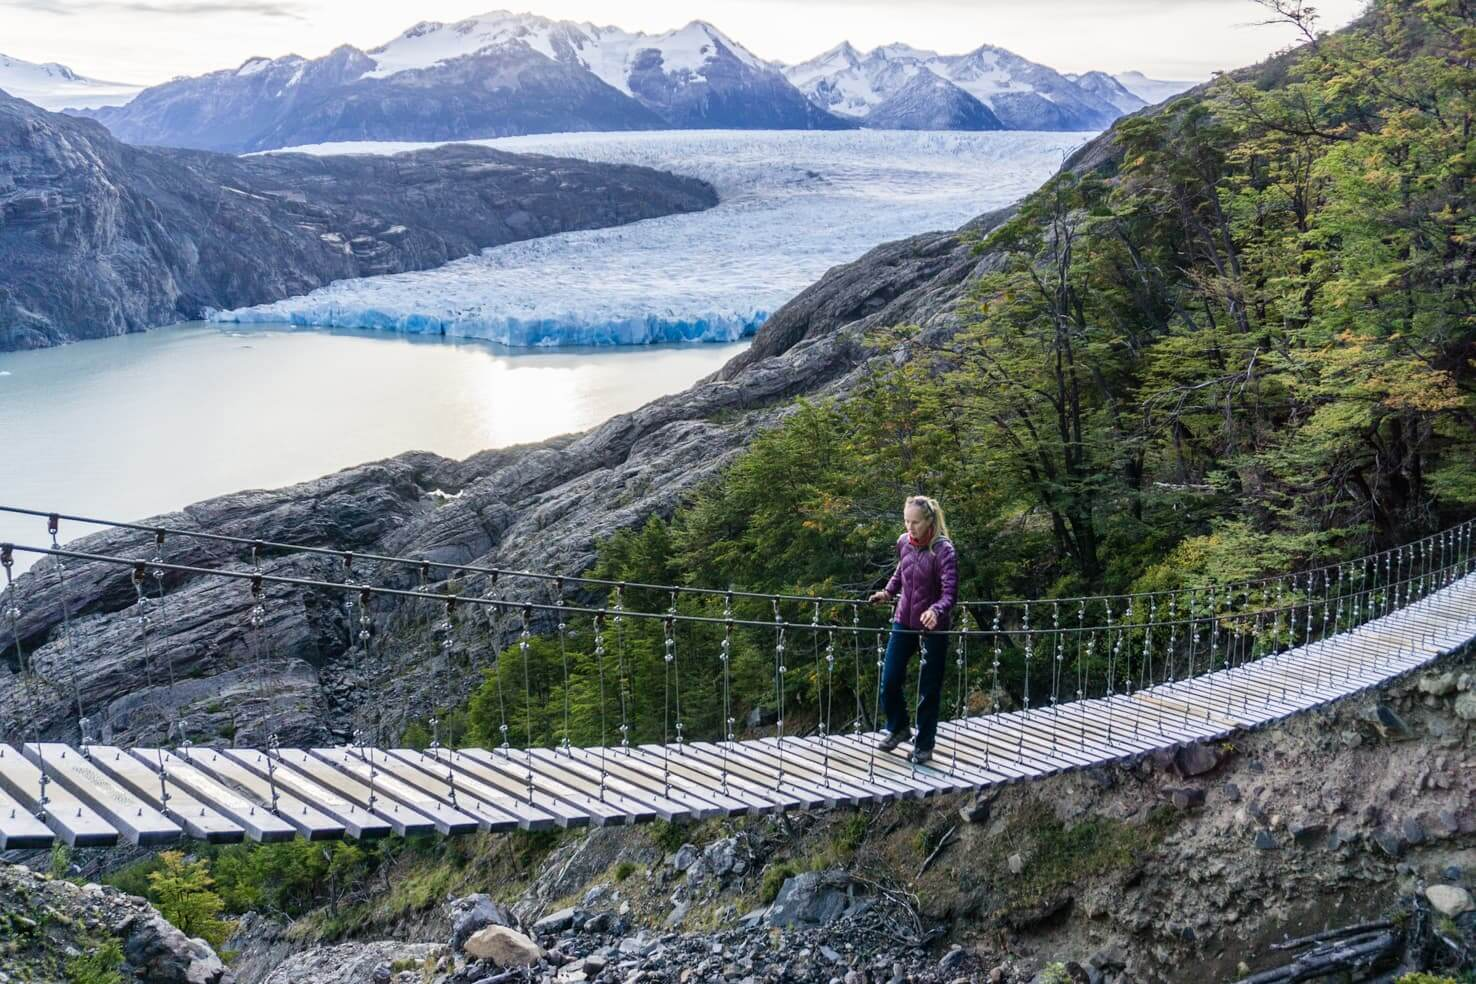 Trekking Torres del Paine W trek Patagonia, Chile Grey Glacier